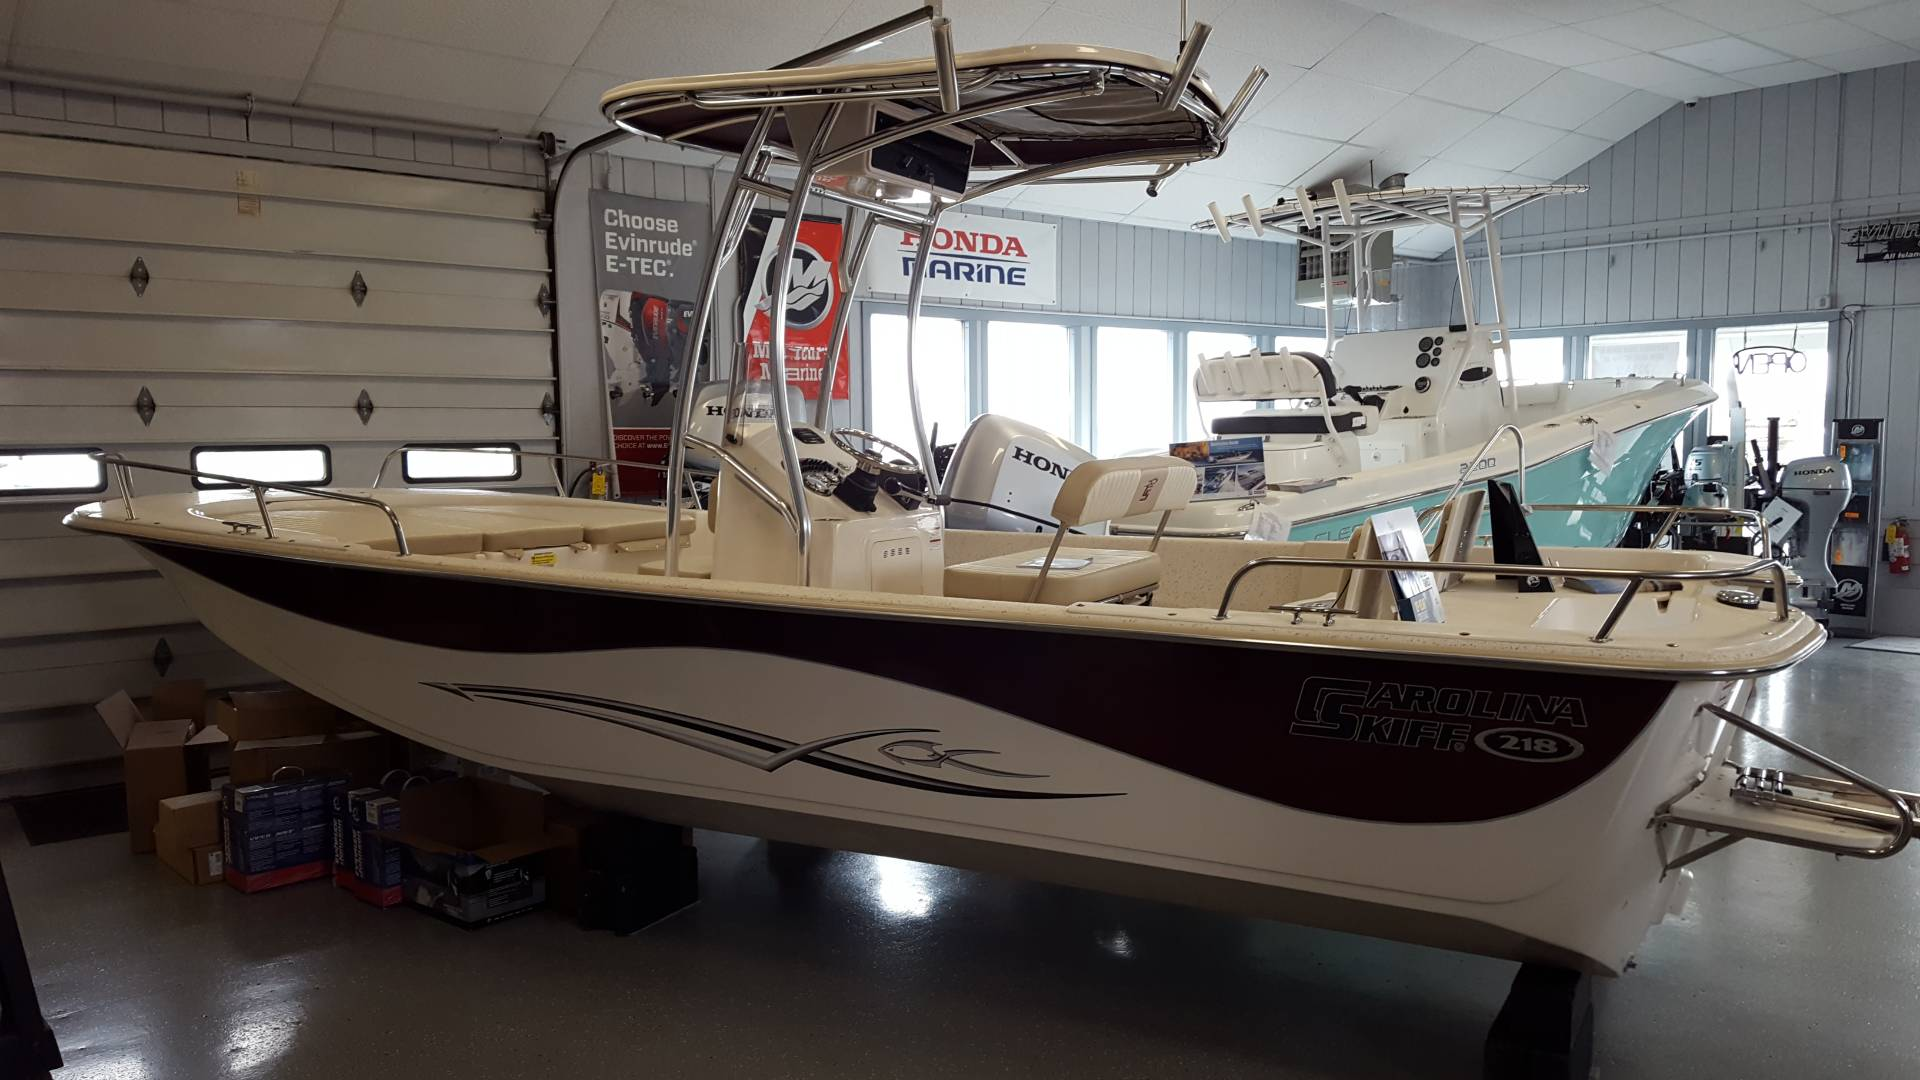 New 2019 Carolina Skiff 218 DLV CC PRE RIG Power Boats Outboard in